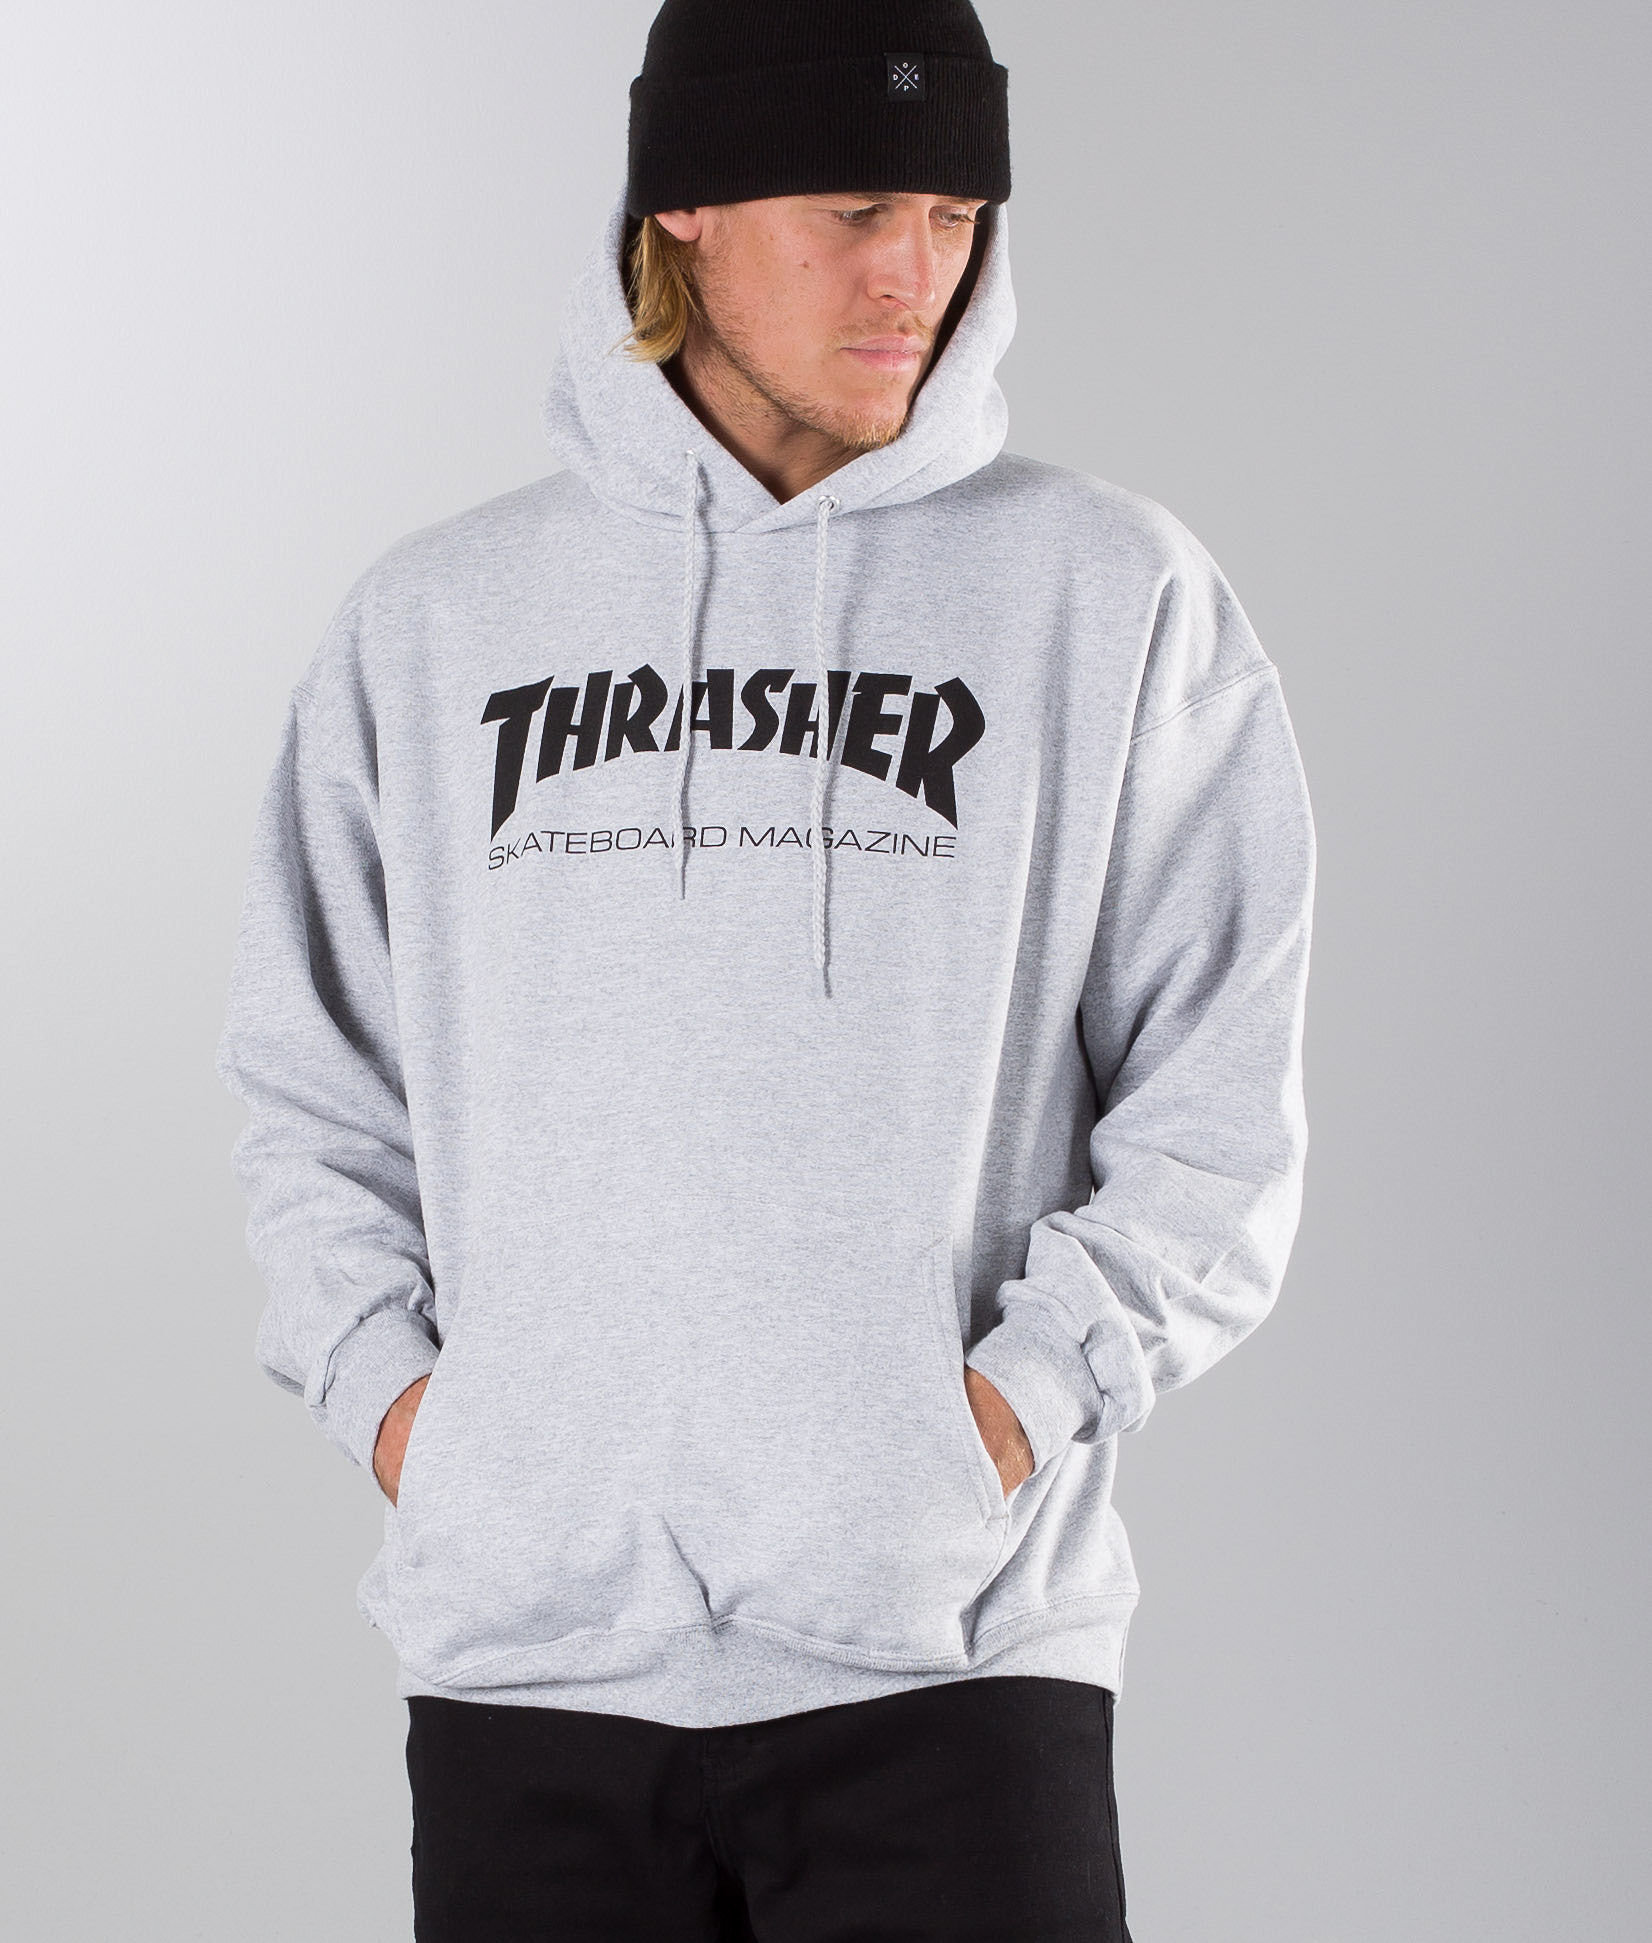 c25f3c1c0290 Thrasher Skate Mag Sweater Grey - Ridestore.com